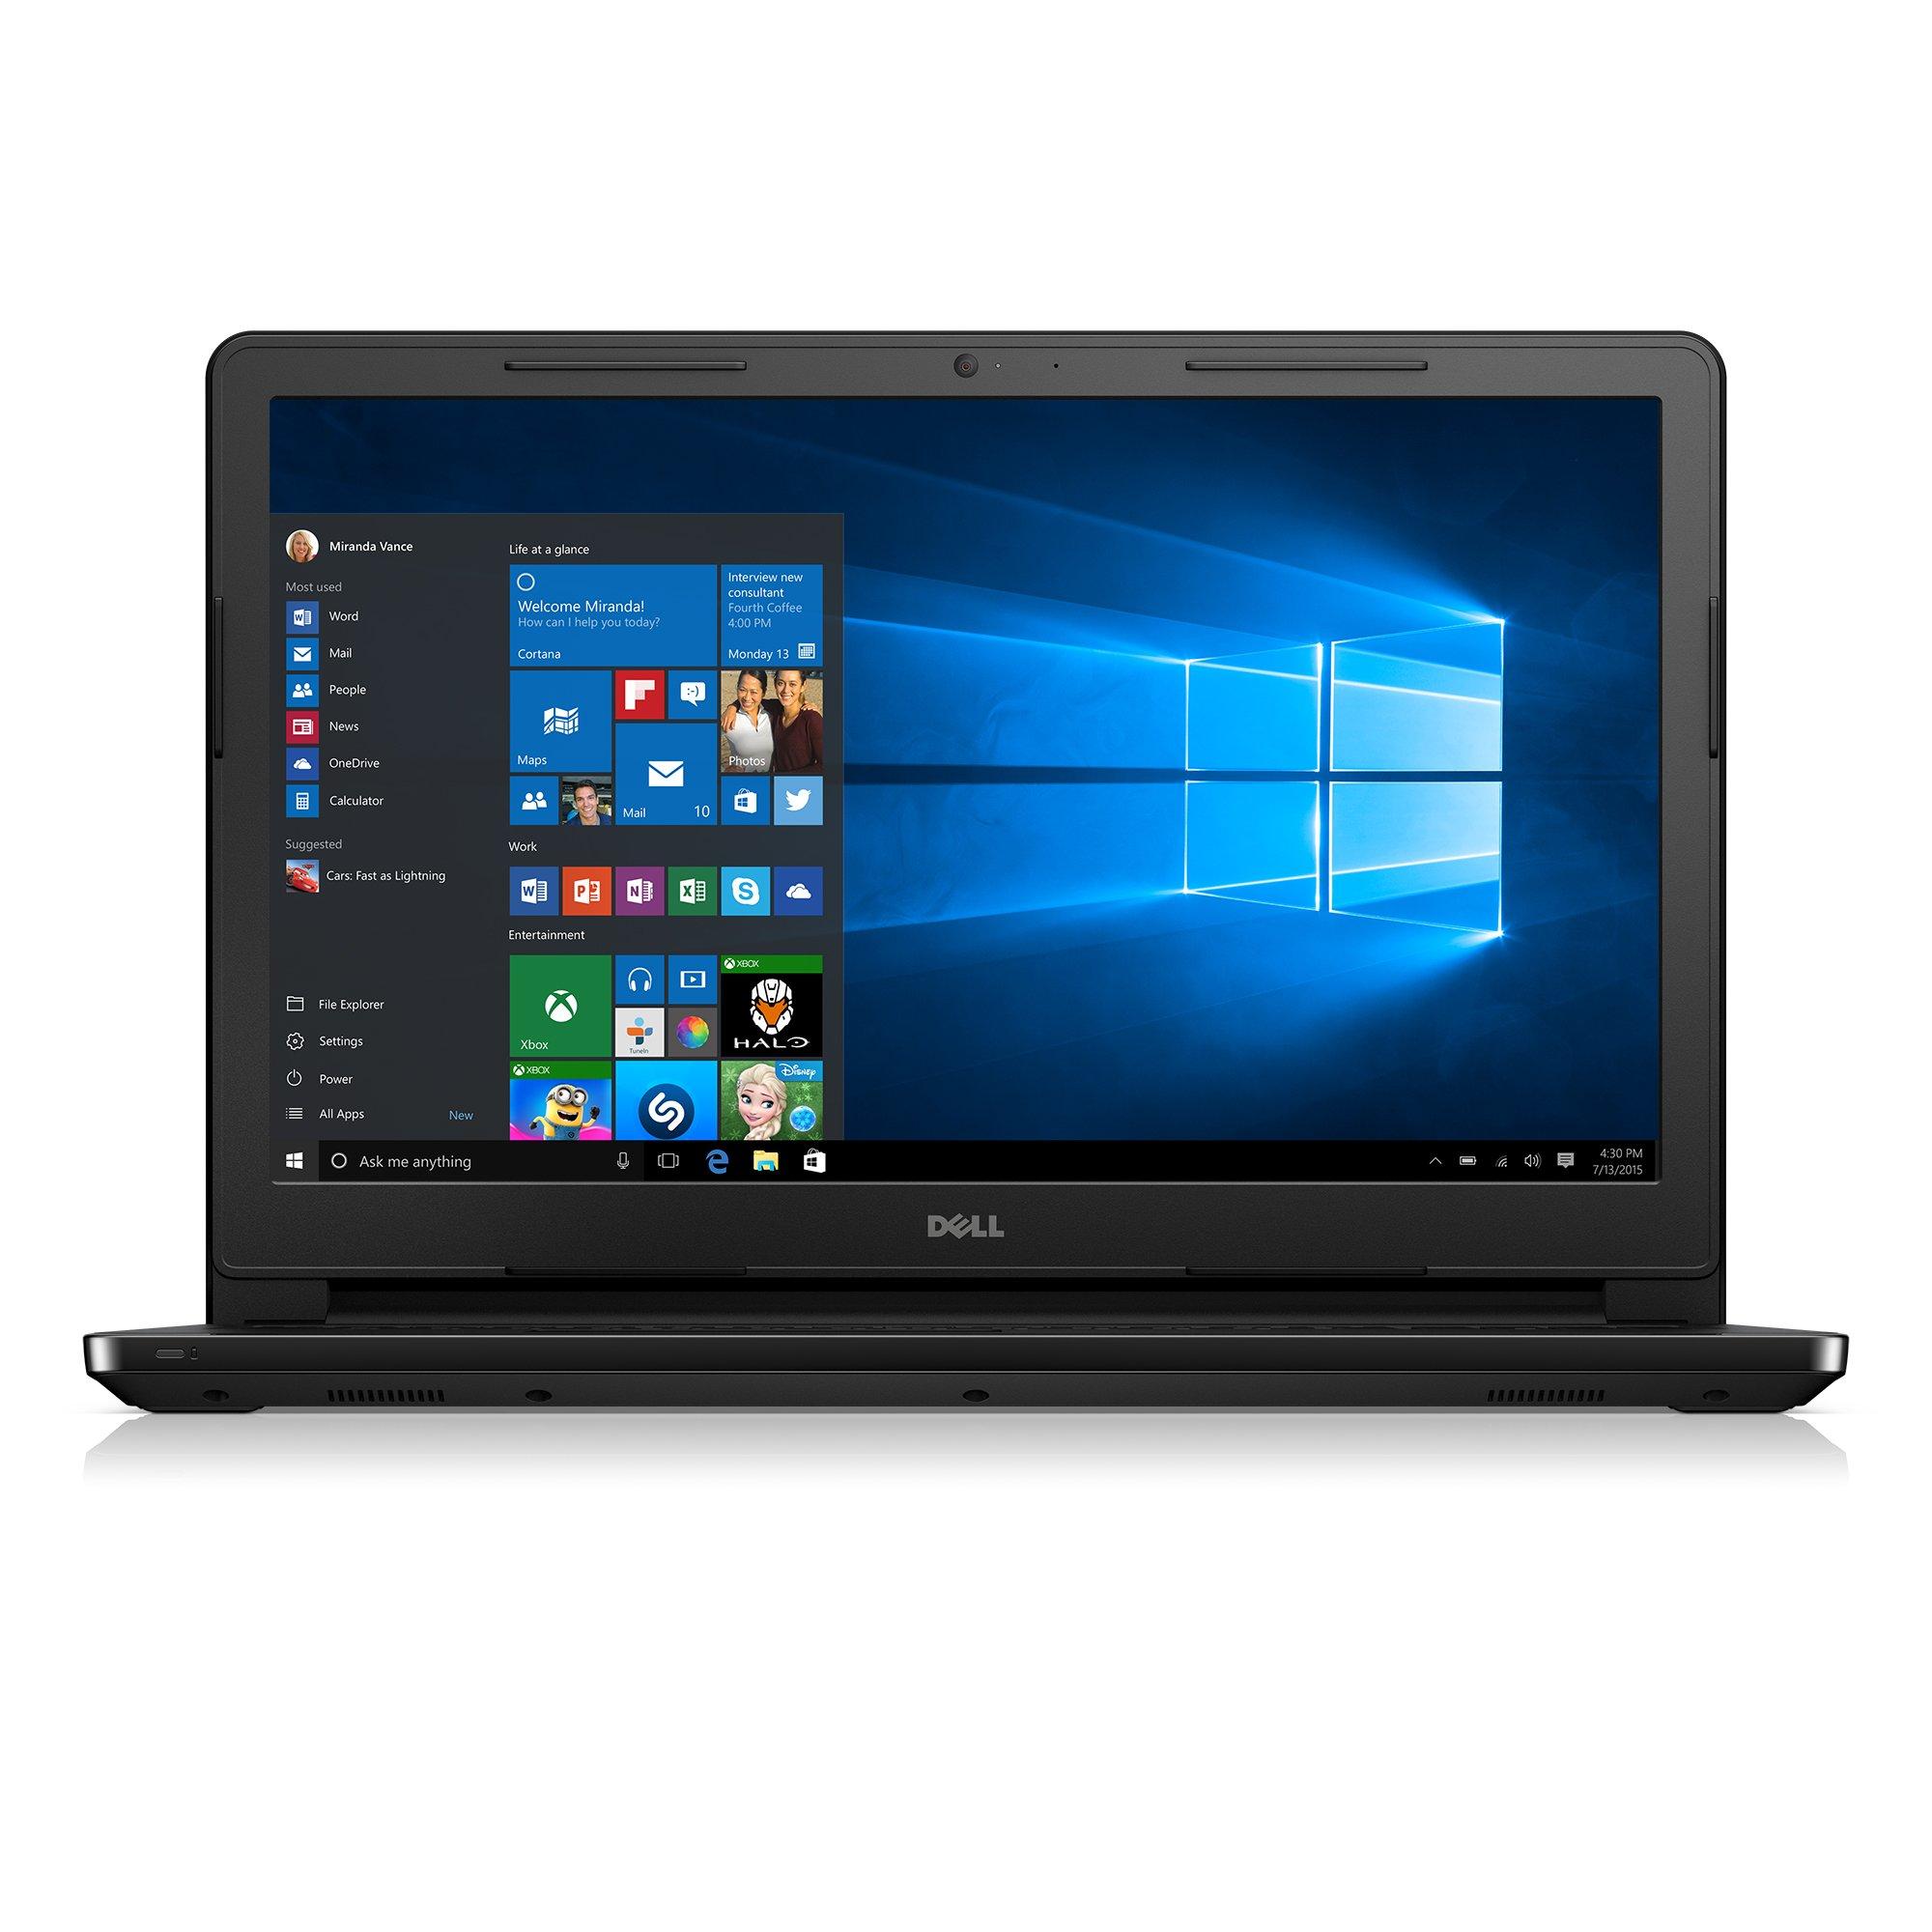 Dell Inspiron i3552-4042BLK 15.6 Inch Laptop (Intel Celeron, 4 GB RAM, 500 GB HDD, Black) by Dell